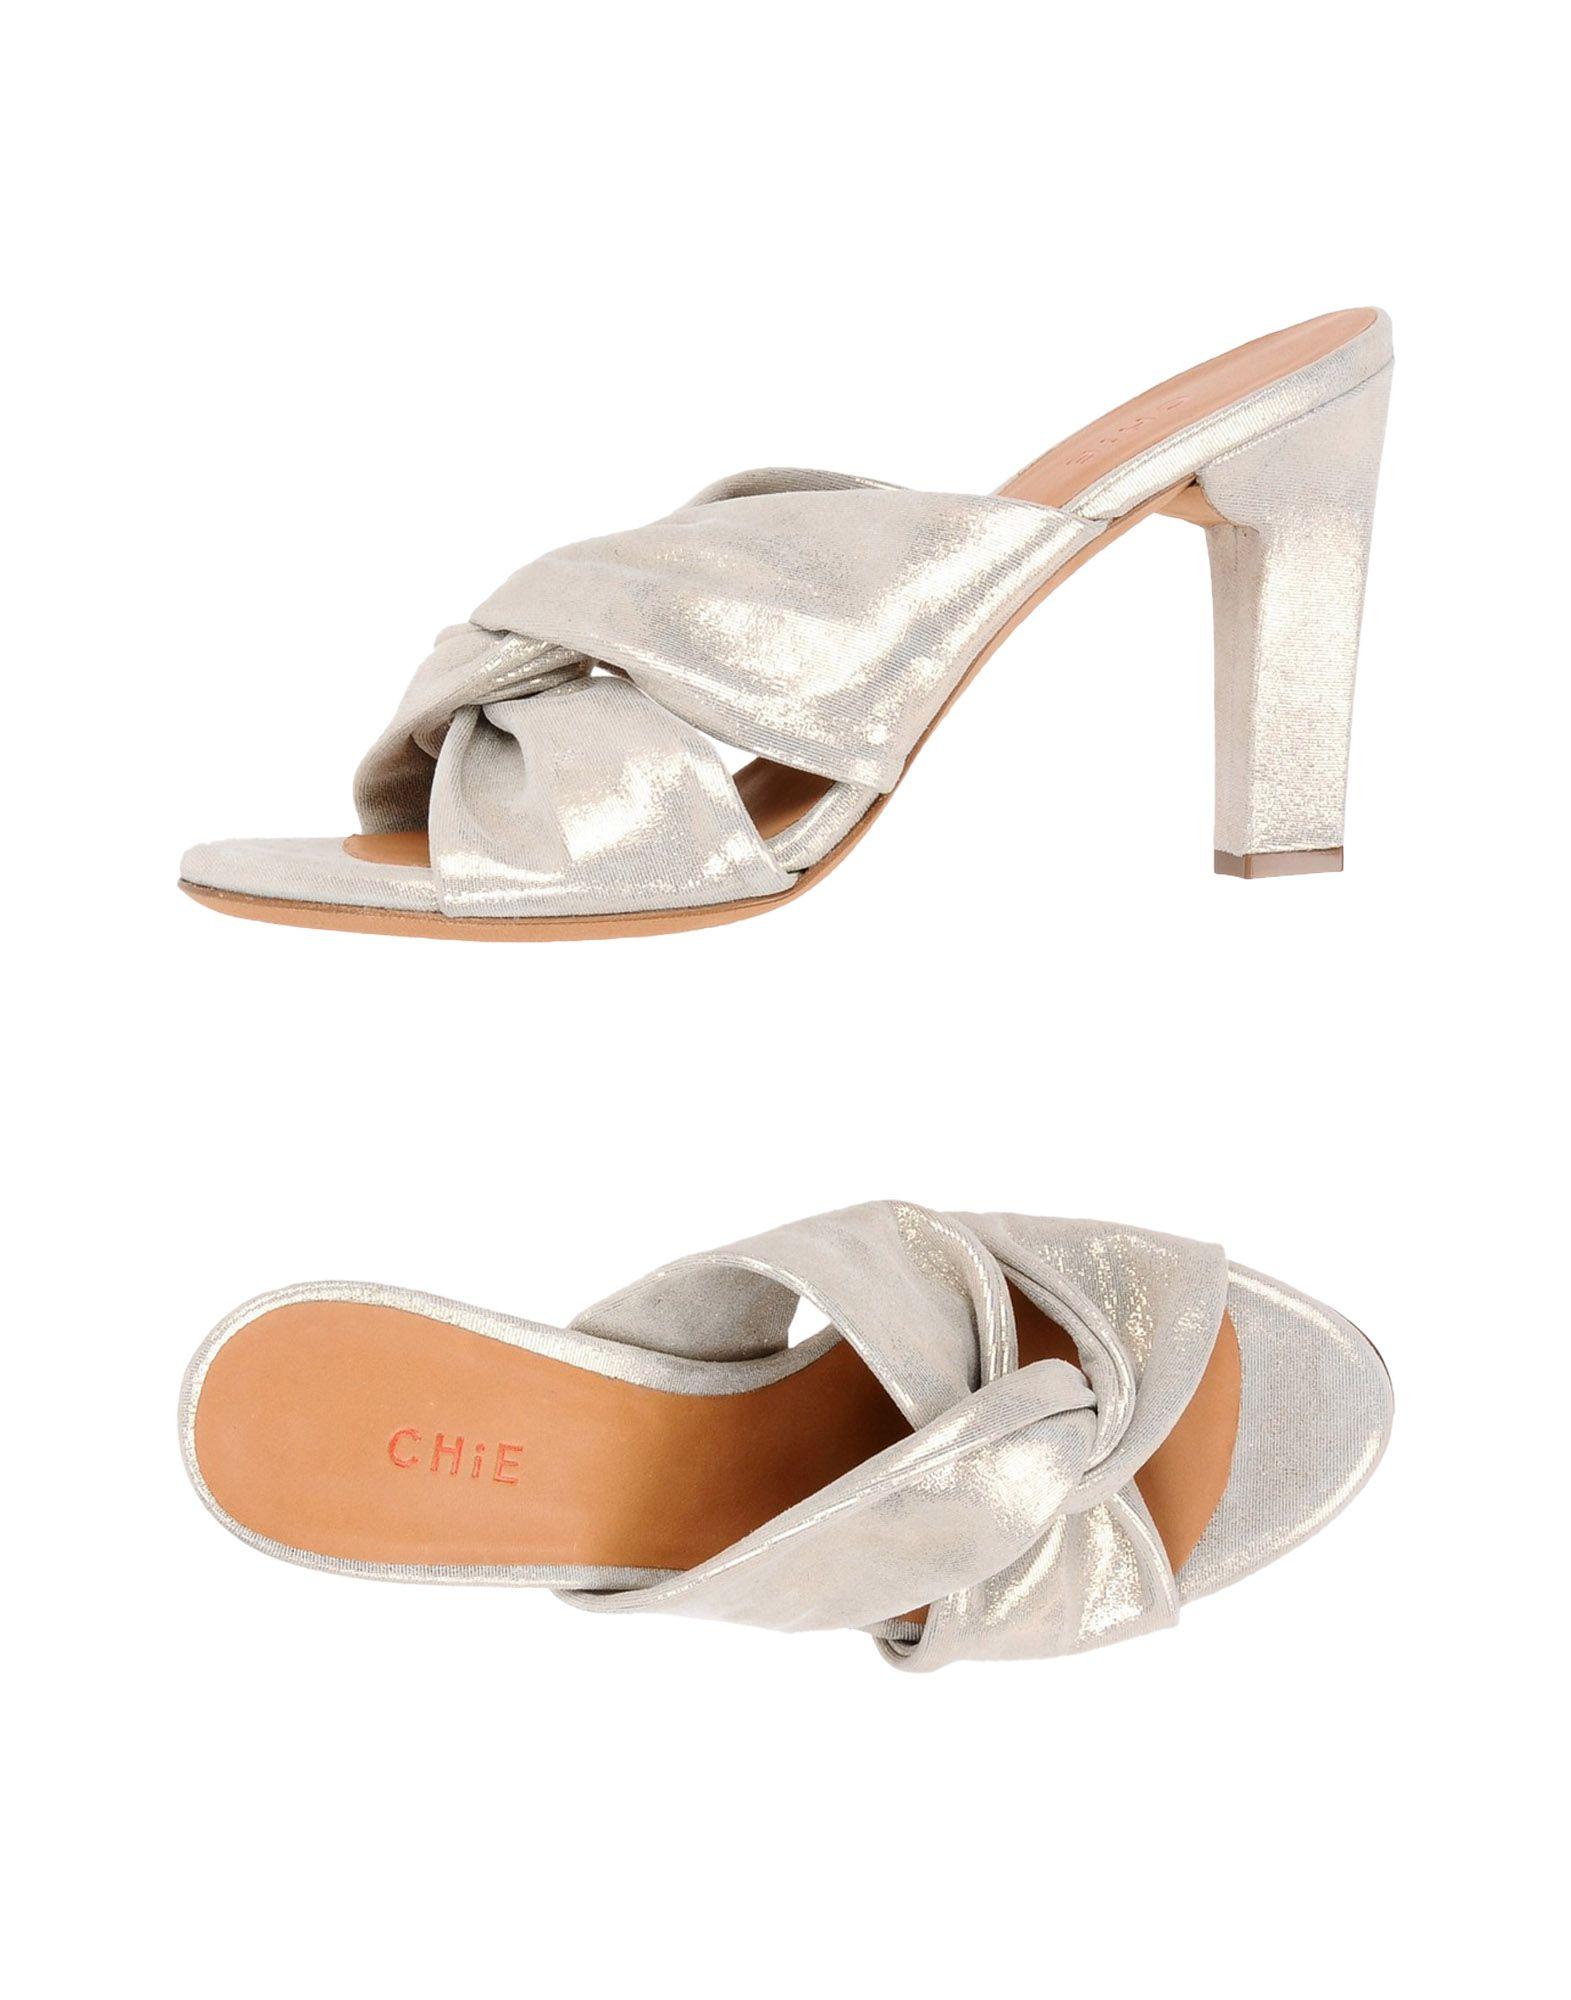 Sandales Chie By Chie Mihara D-Sonya32 - Femme - Sandales Chie By Chie Mihara sur